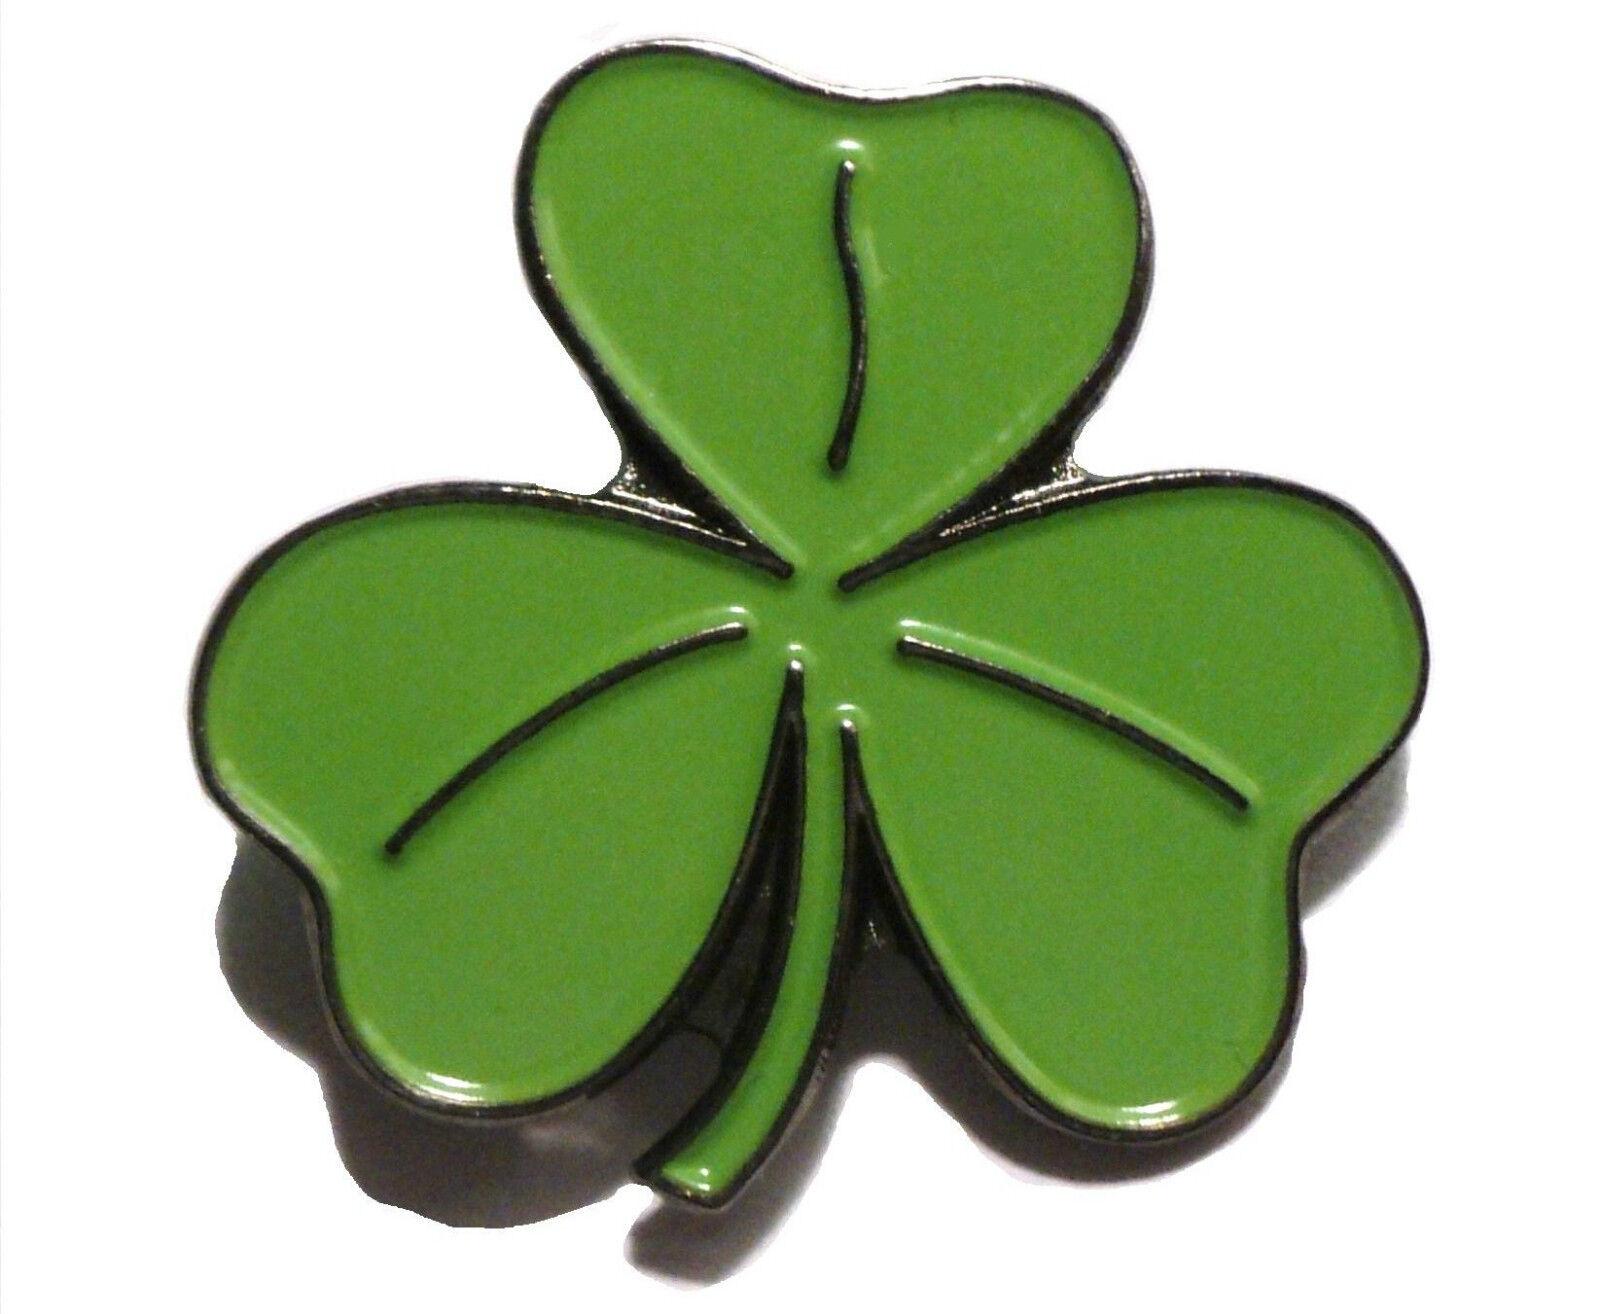 10 IRELAND LUCKY IRISH SHAMROCK PIN BADGES